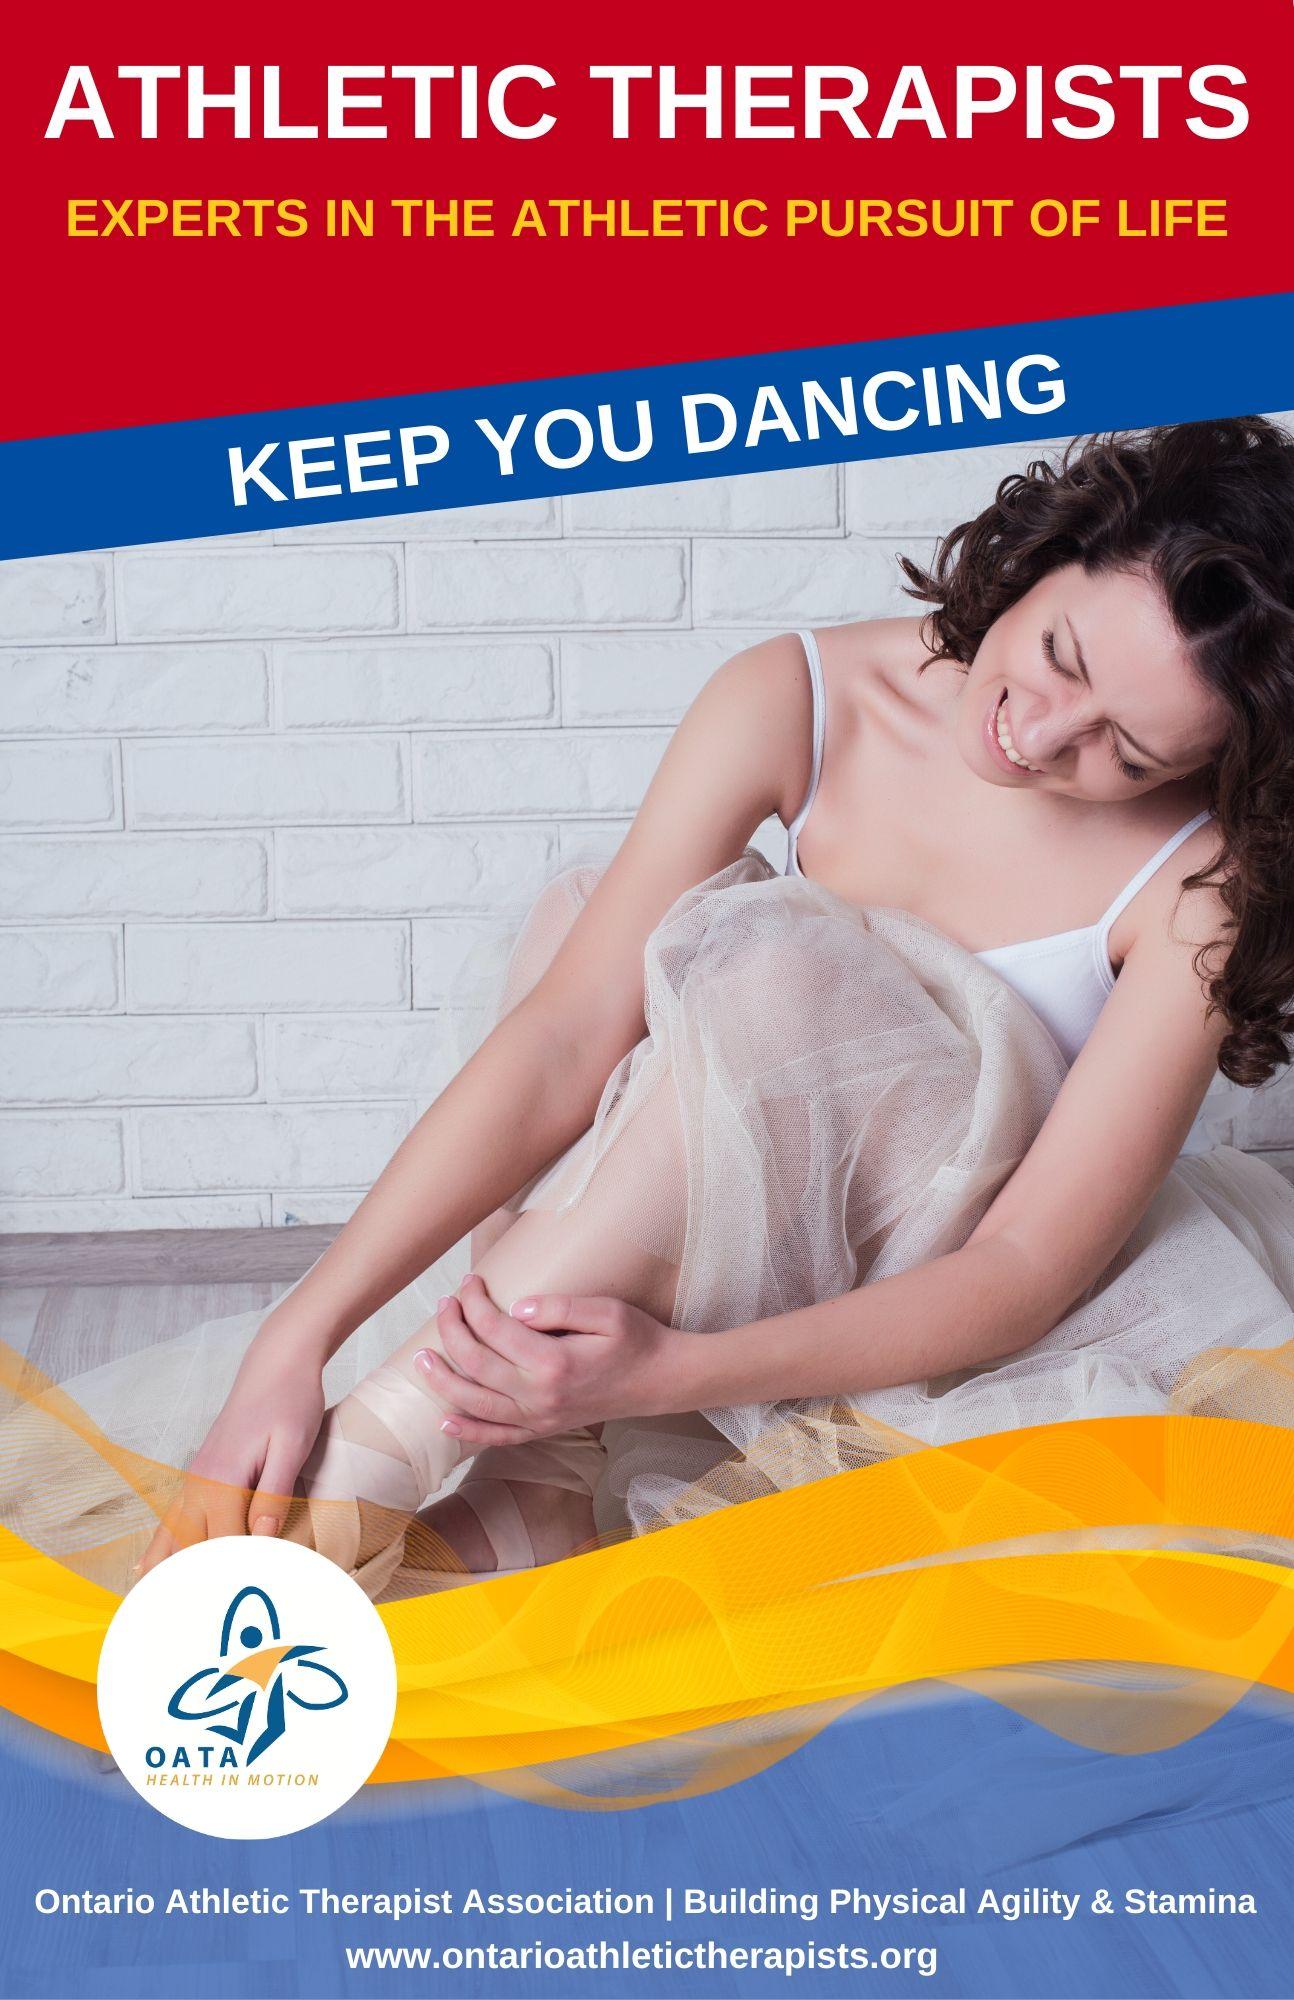 Keep You Dancing